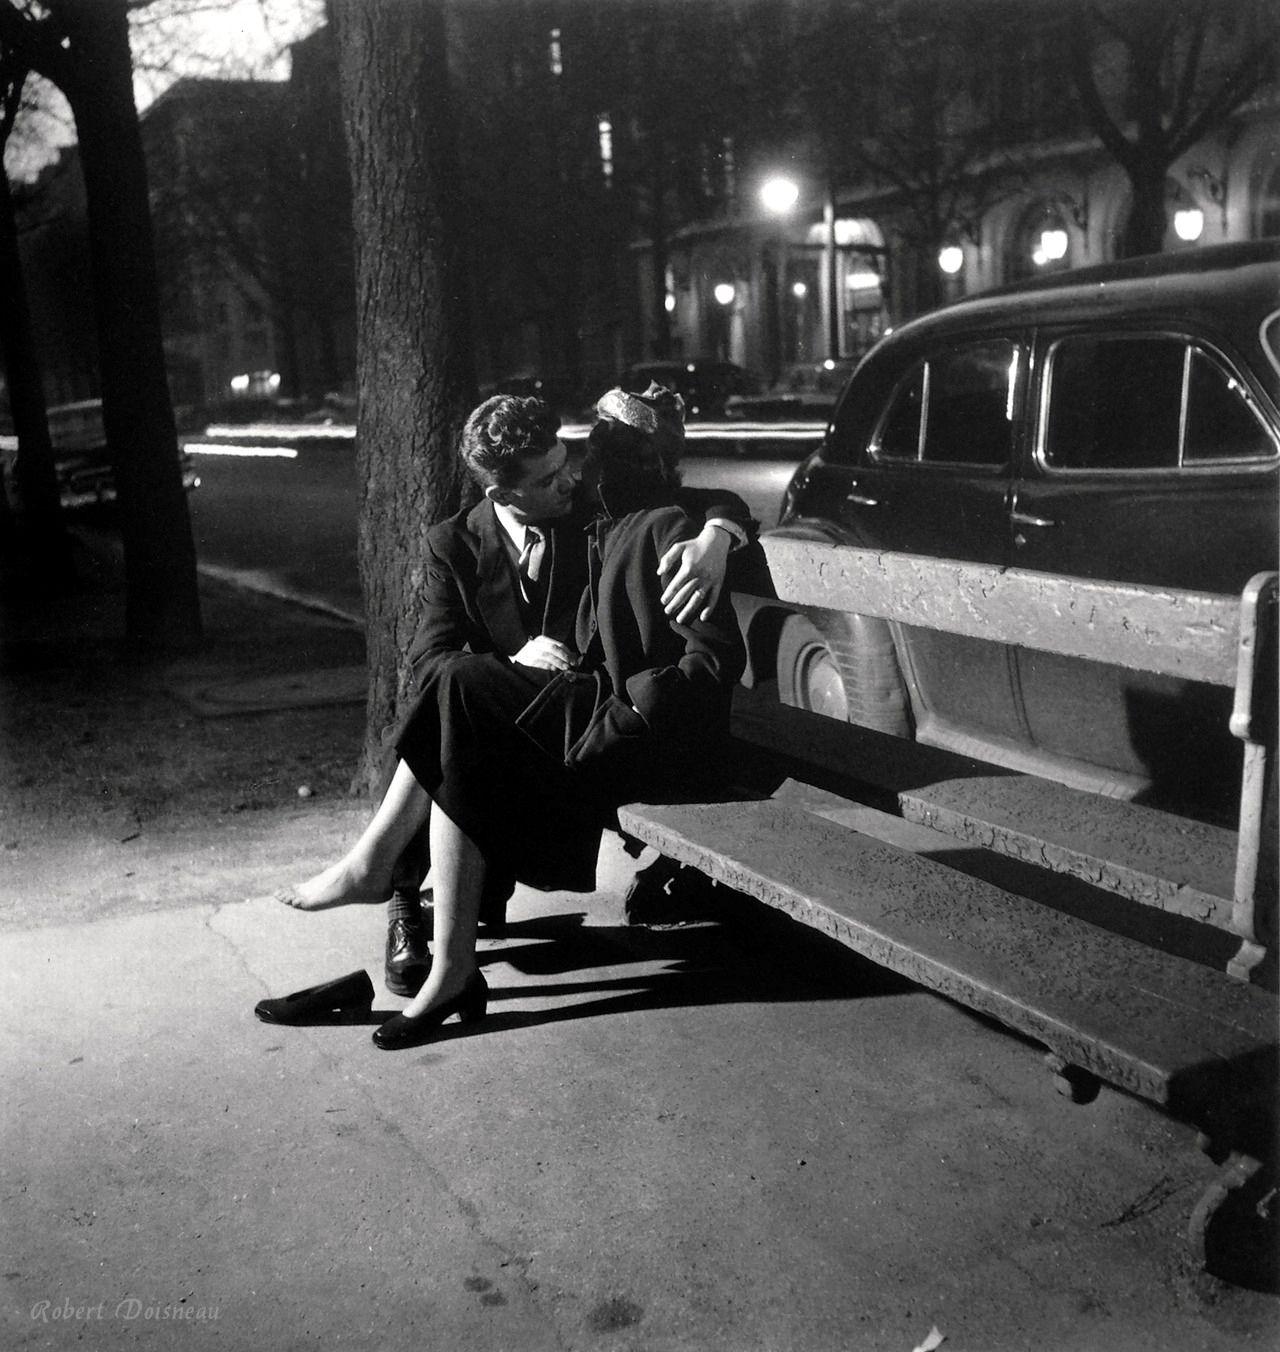 Trig & Polished Approved // Promoting Good Men's Style // www.trigandpolished.com Robert Doisneau Paris 1950s